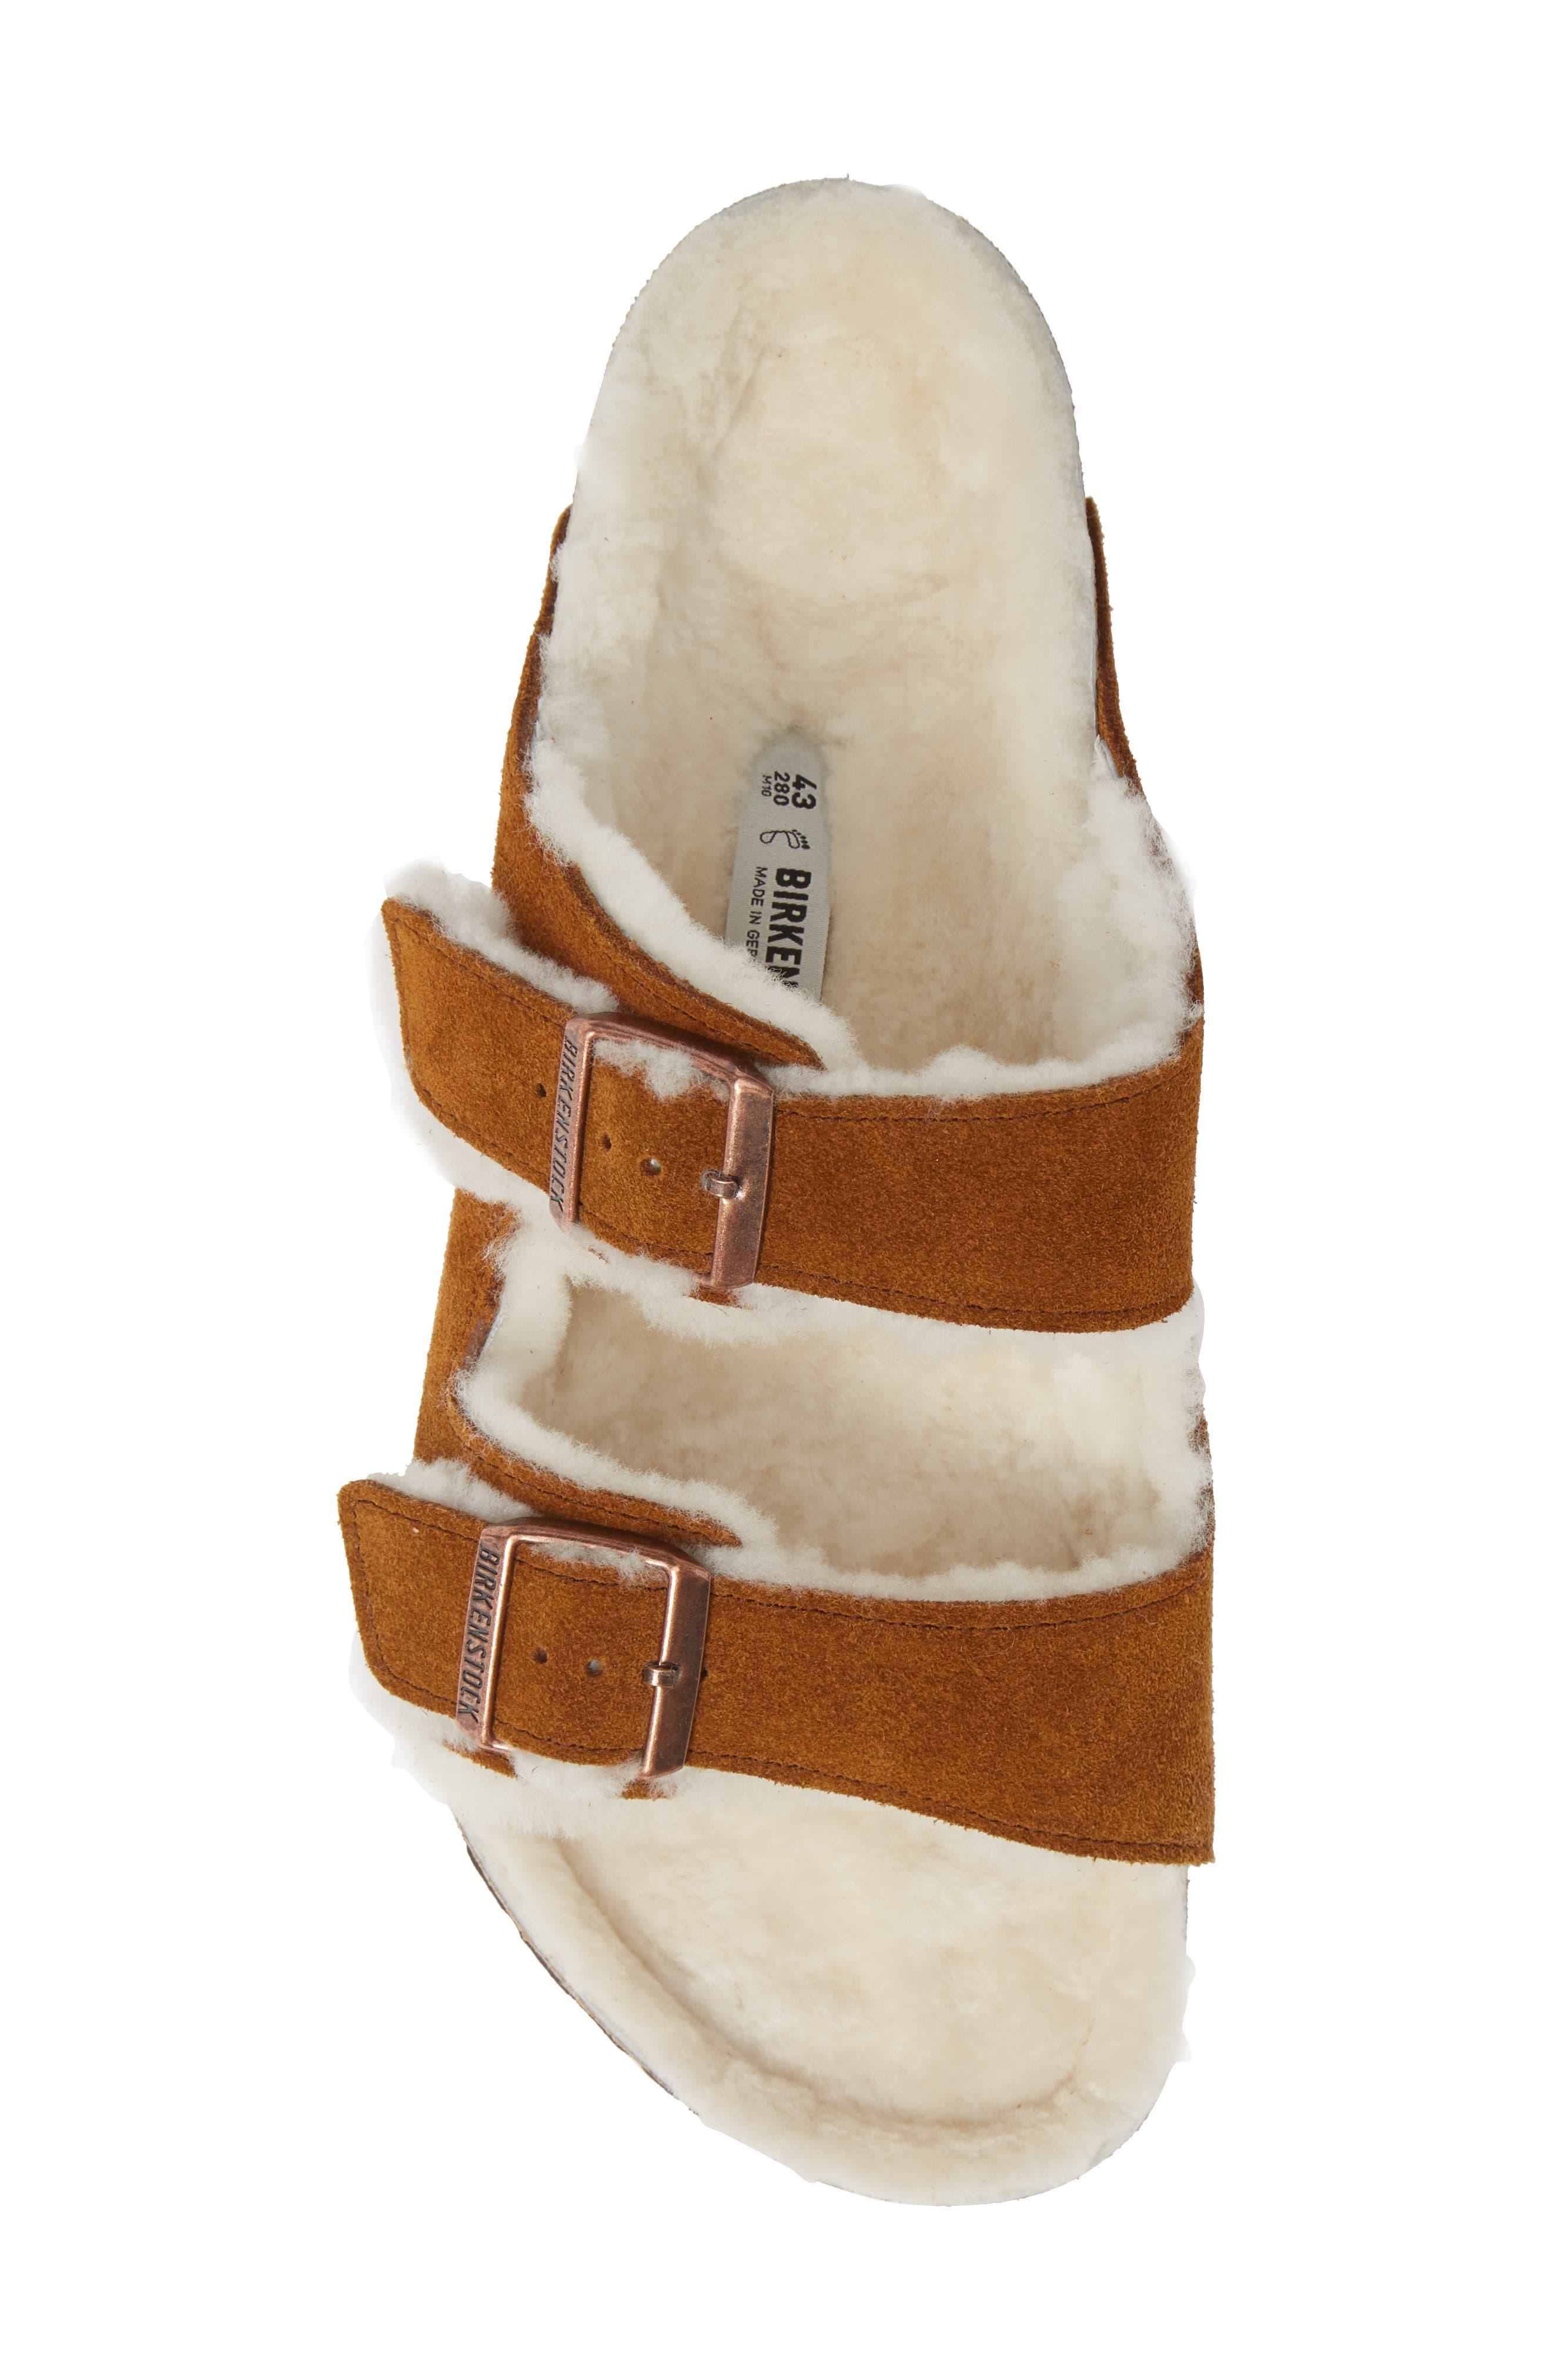 Arizona Slide Sandal with Genuine Shearling,                             Alternate thumbnail 5, color,                             BEIGE